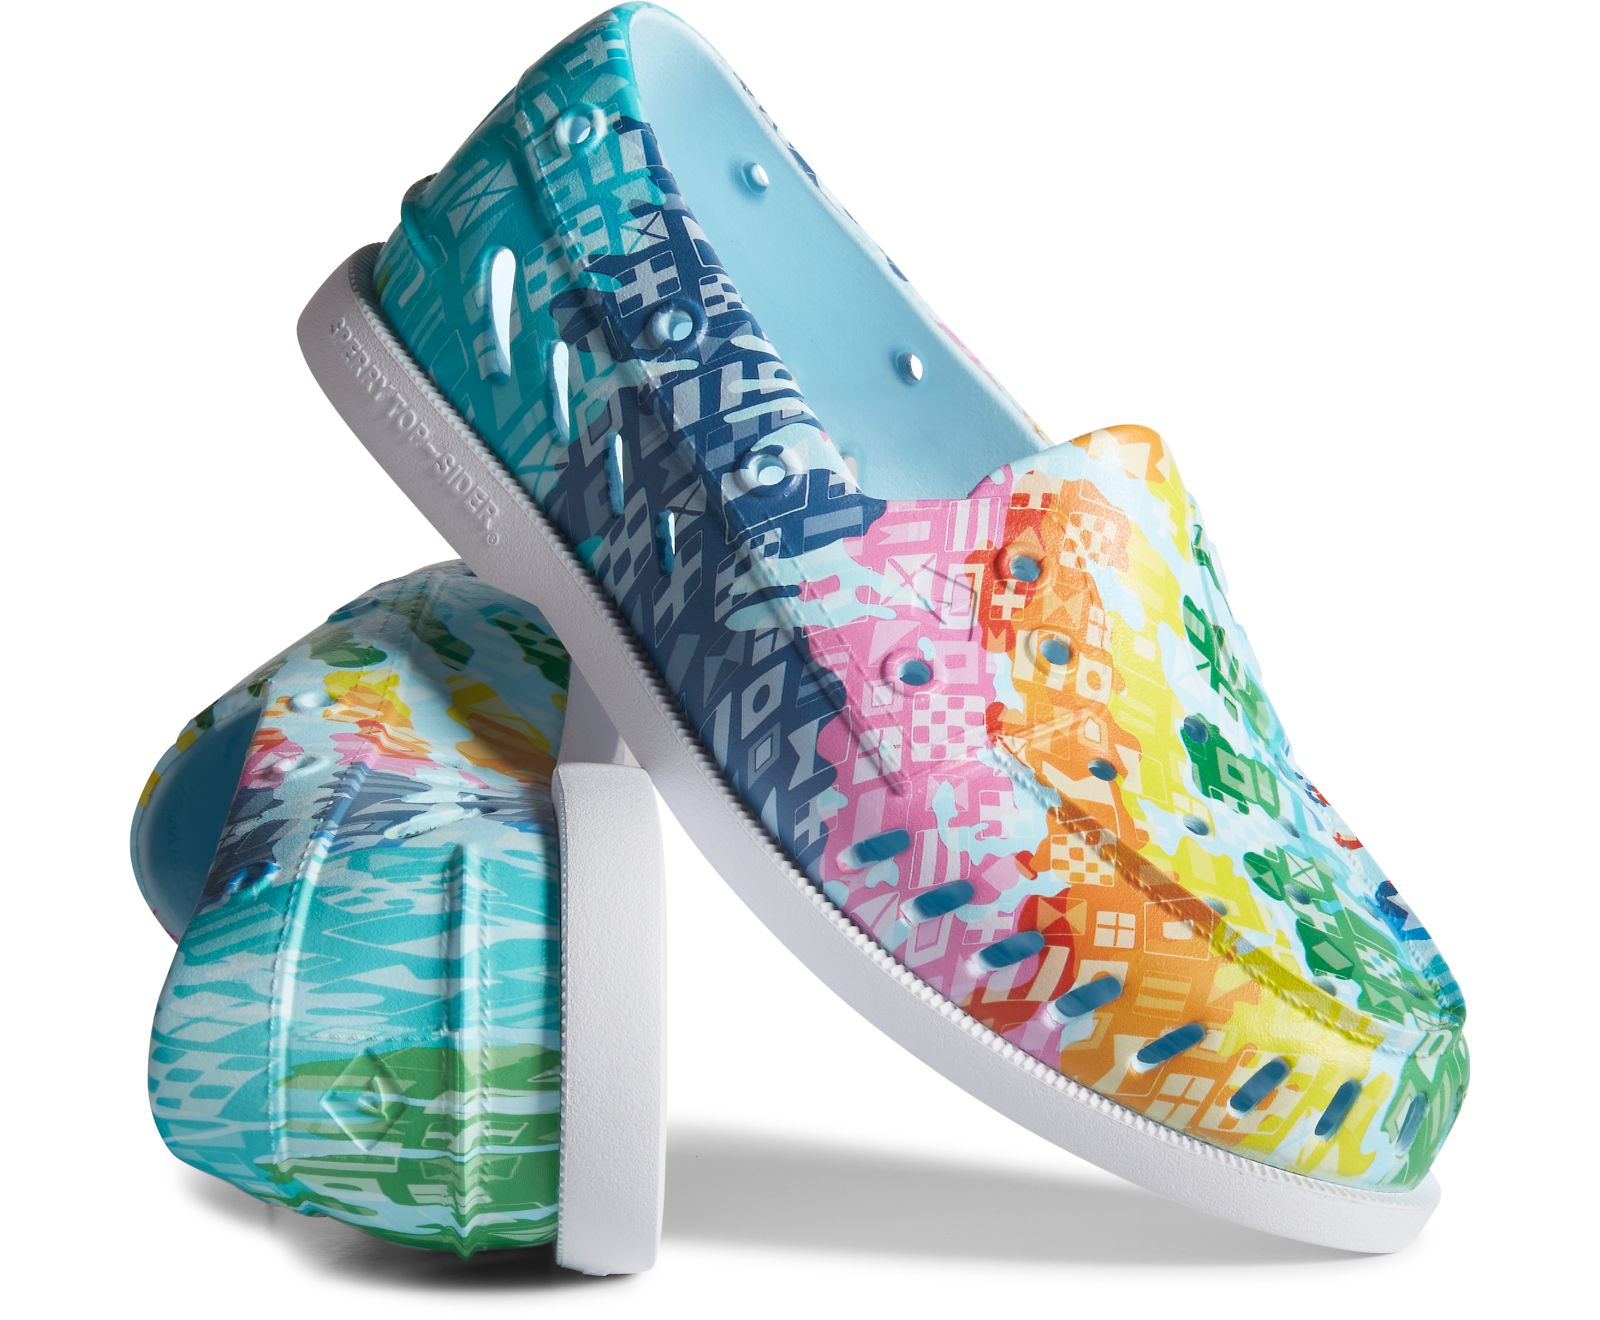 sperry, pride, boat shoe, rainbow, lgbtq, 2021